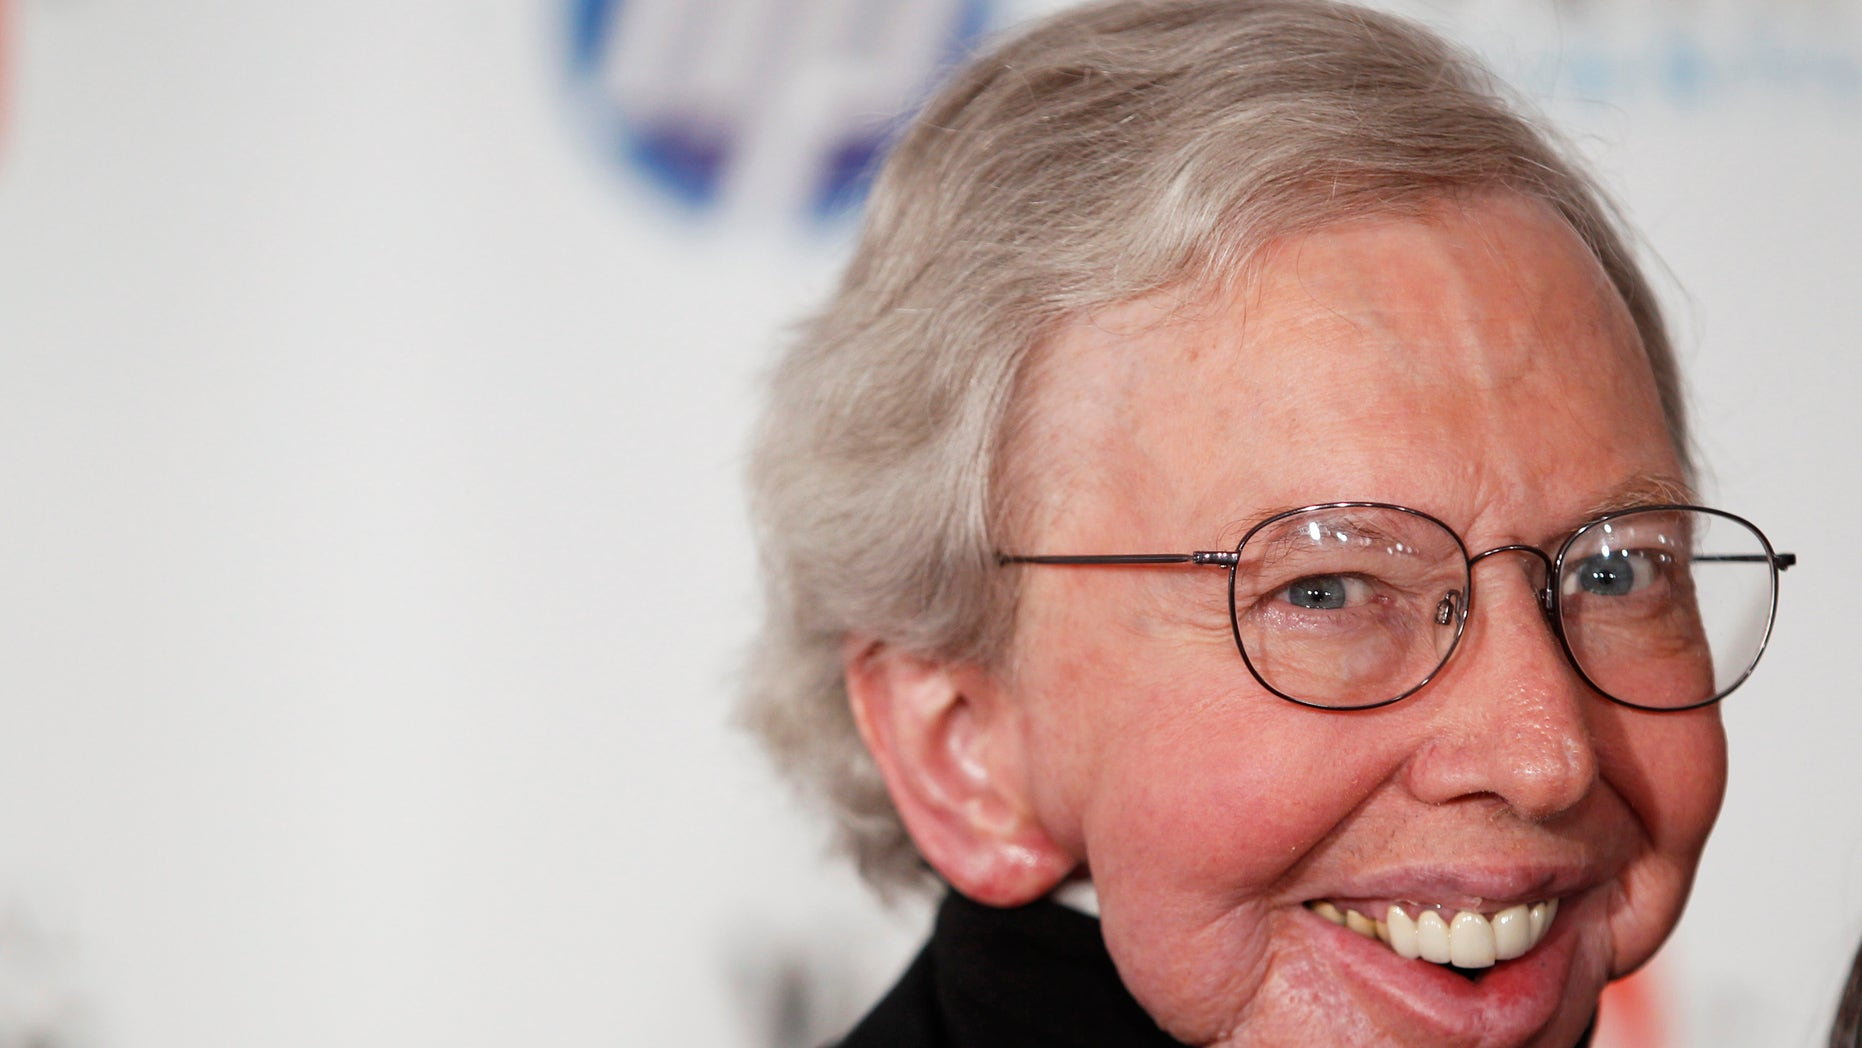 June 14, 2010. Film critic Roger Ebert arrives to attend the Webby Awards in New York.